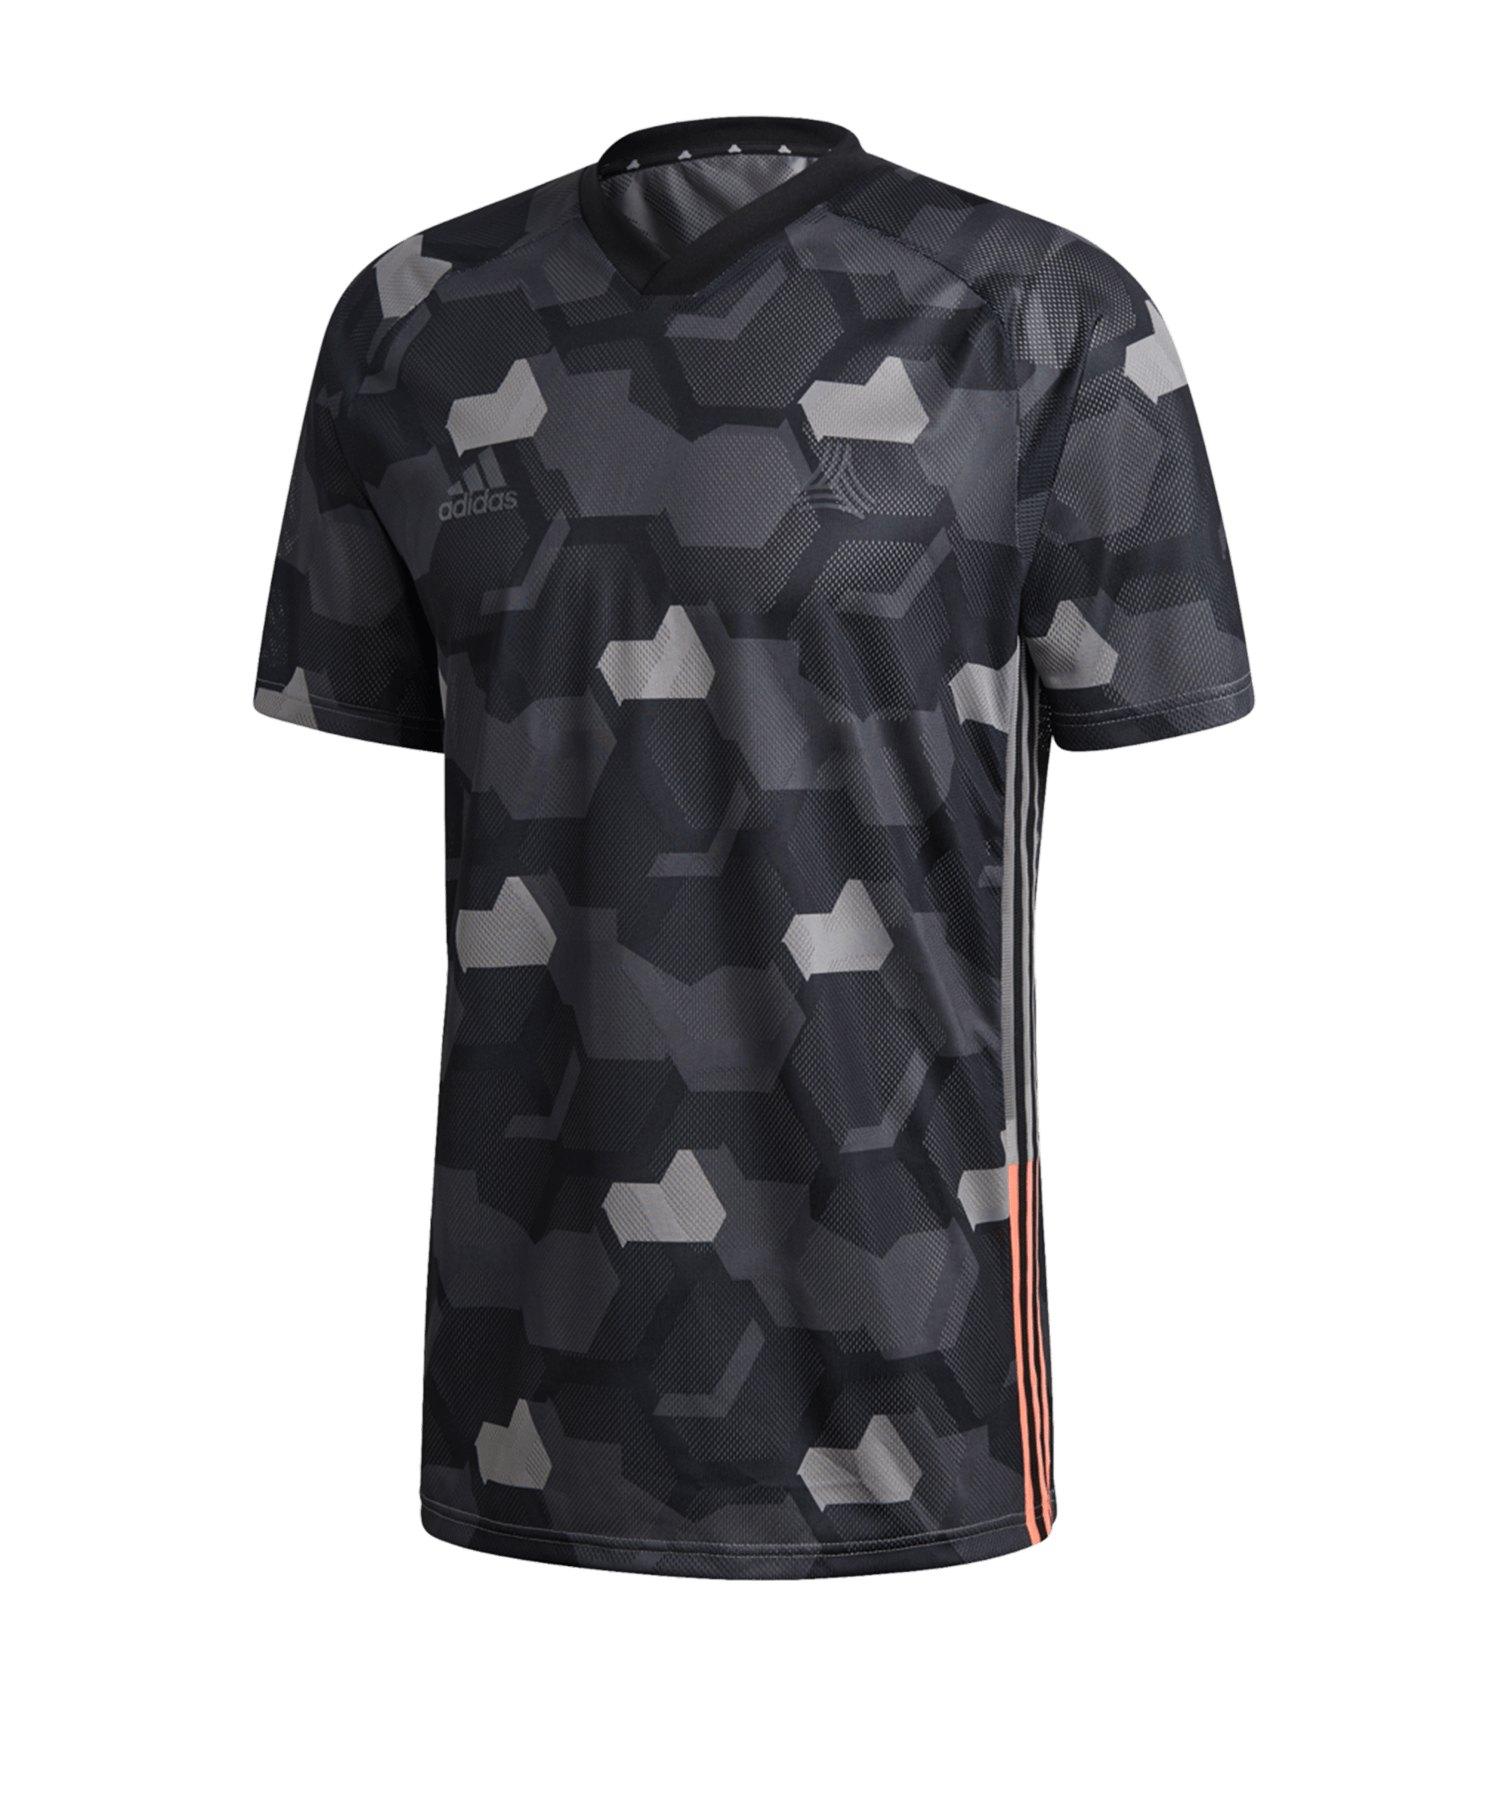 adidas Tango Shirt kurzarm Schwarz - schwarz